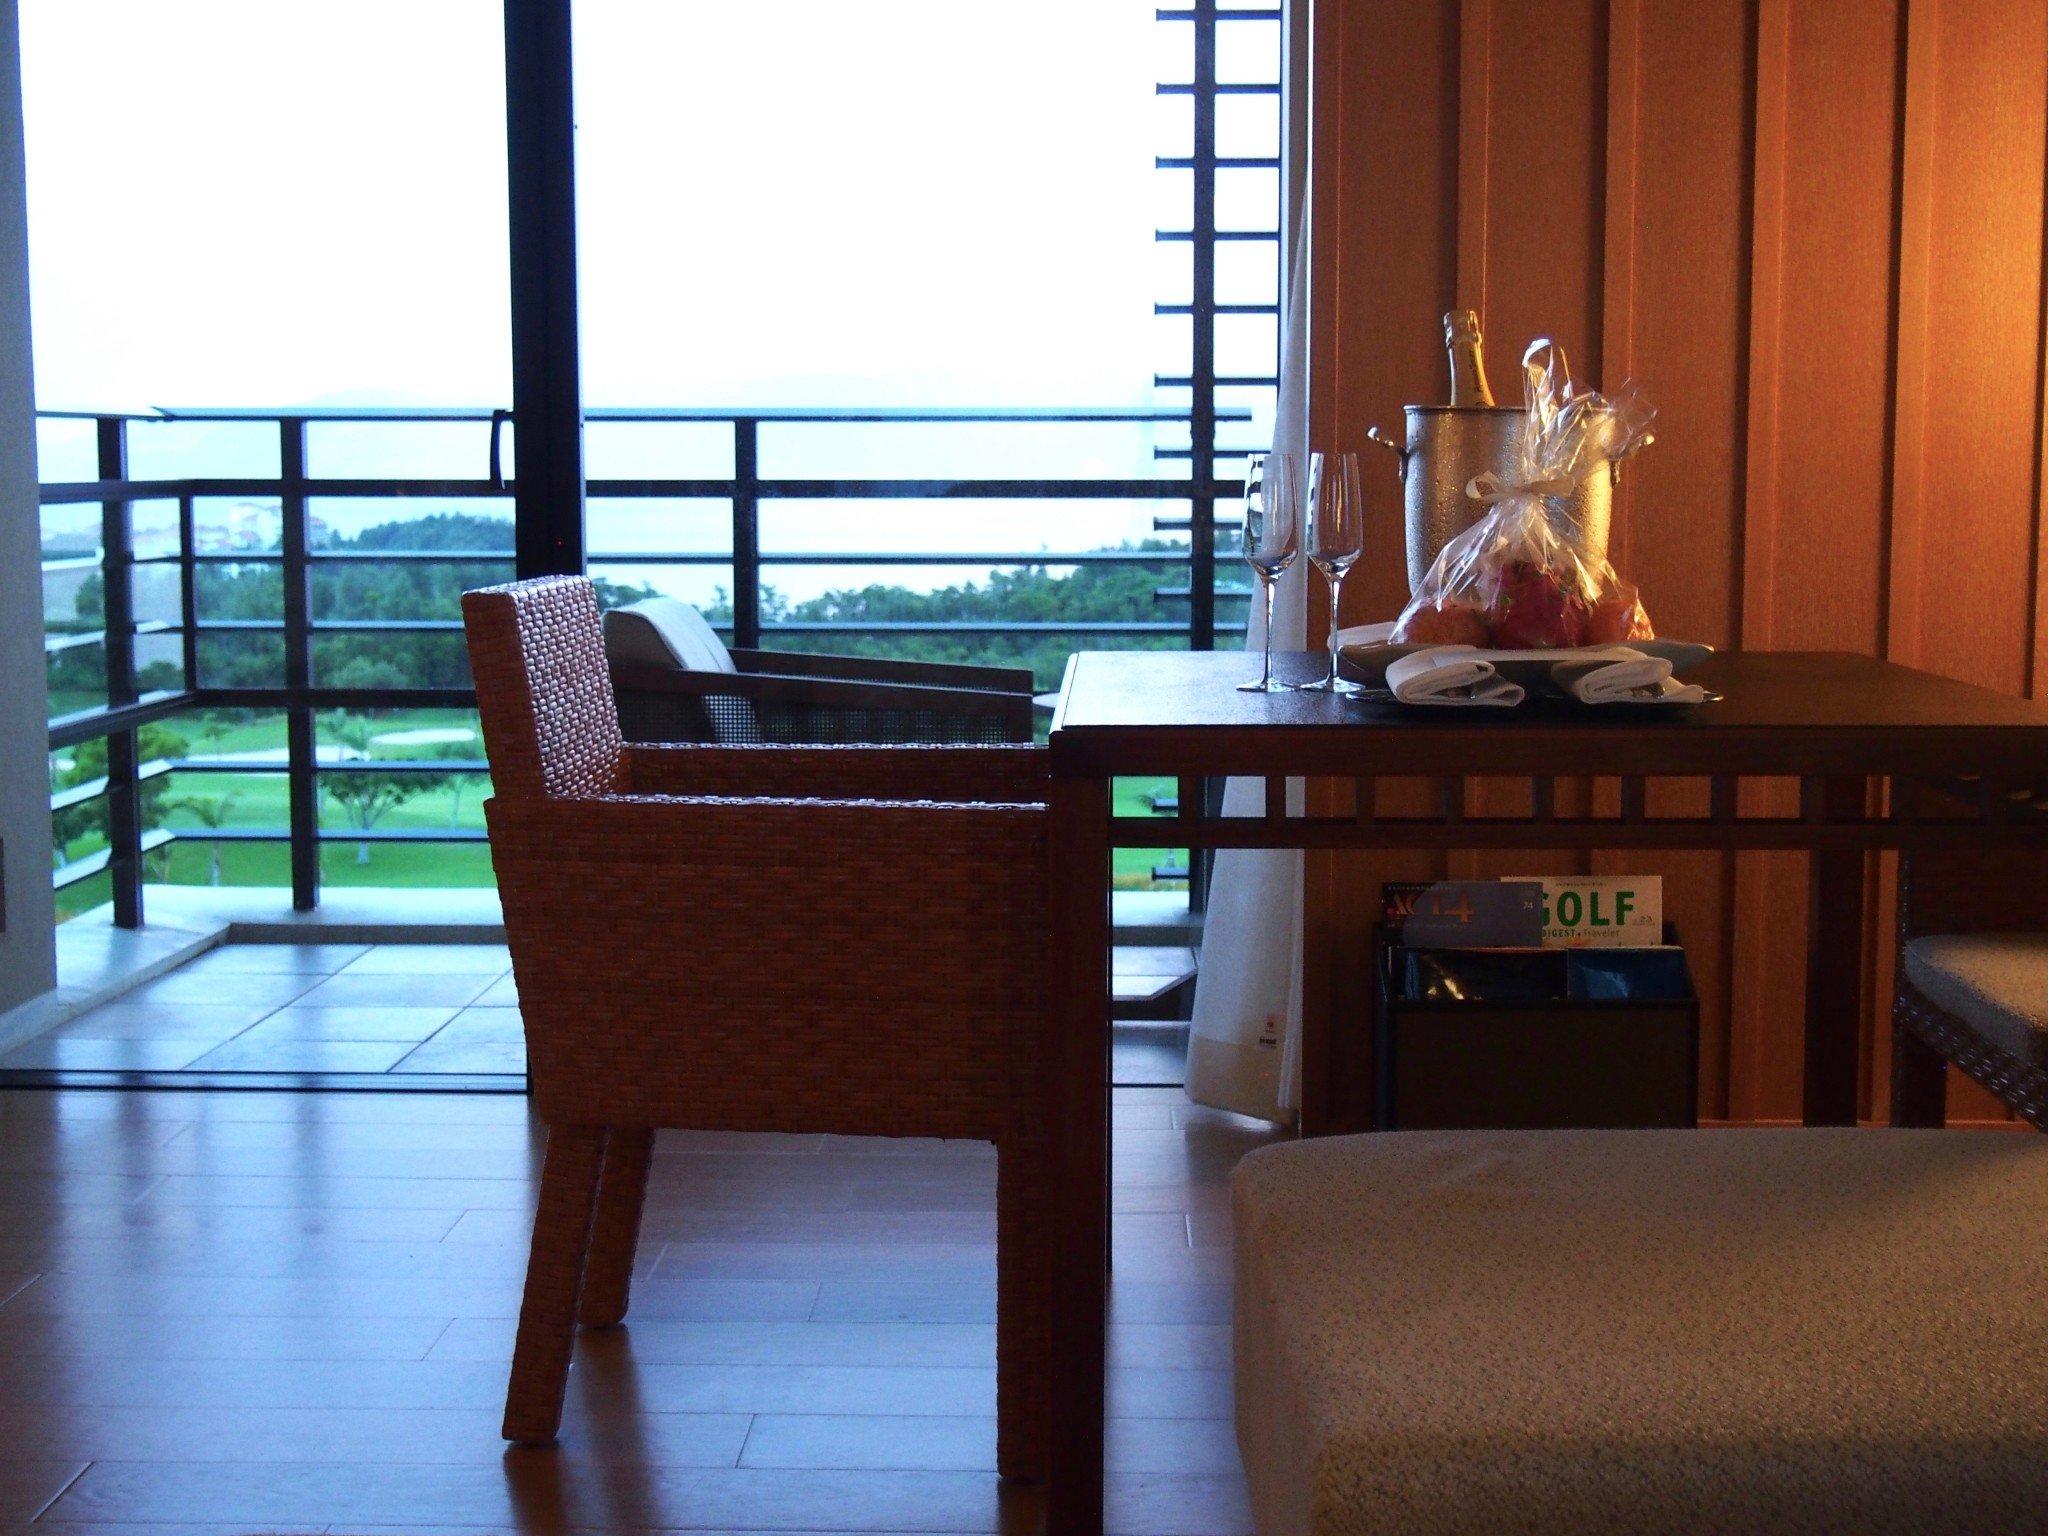 Ritz-Carlton Okinawa olohuone 1